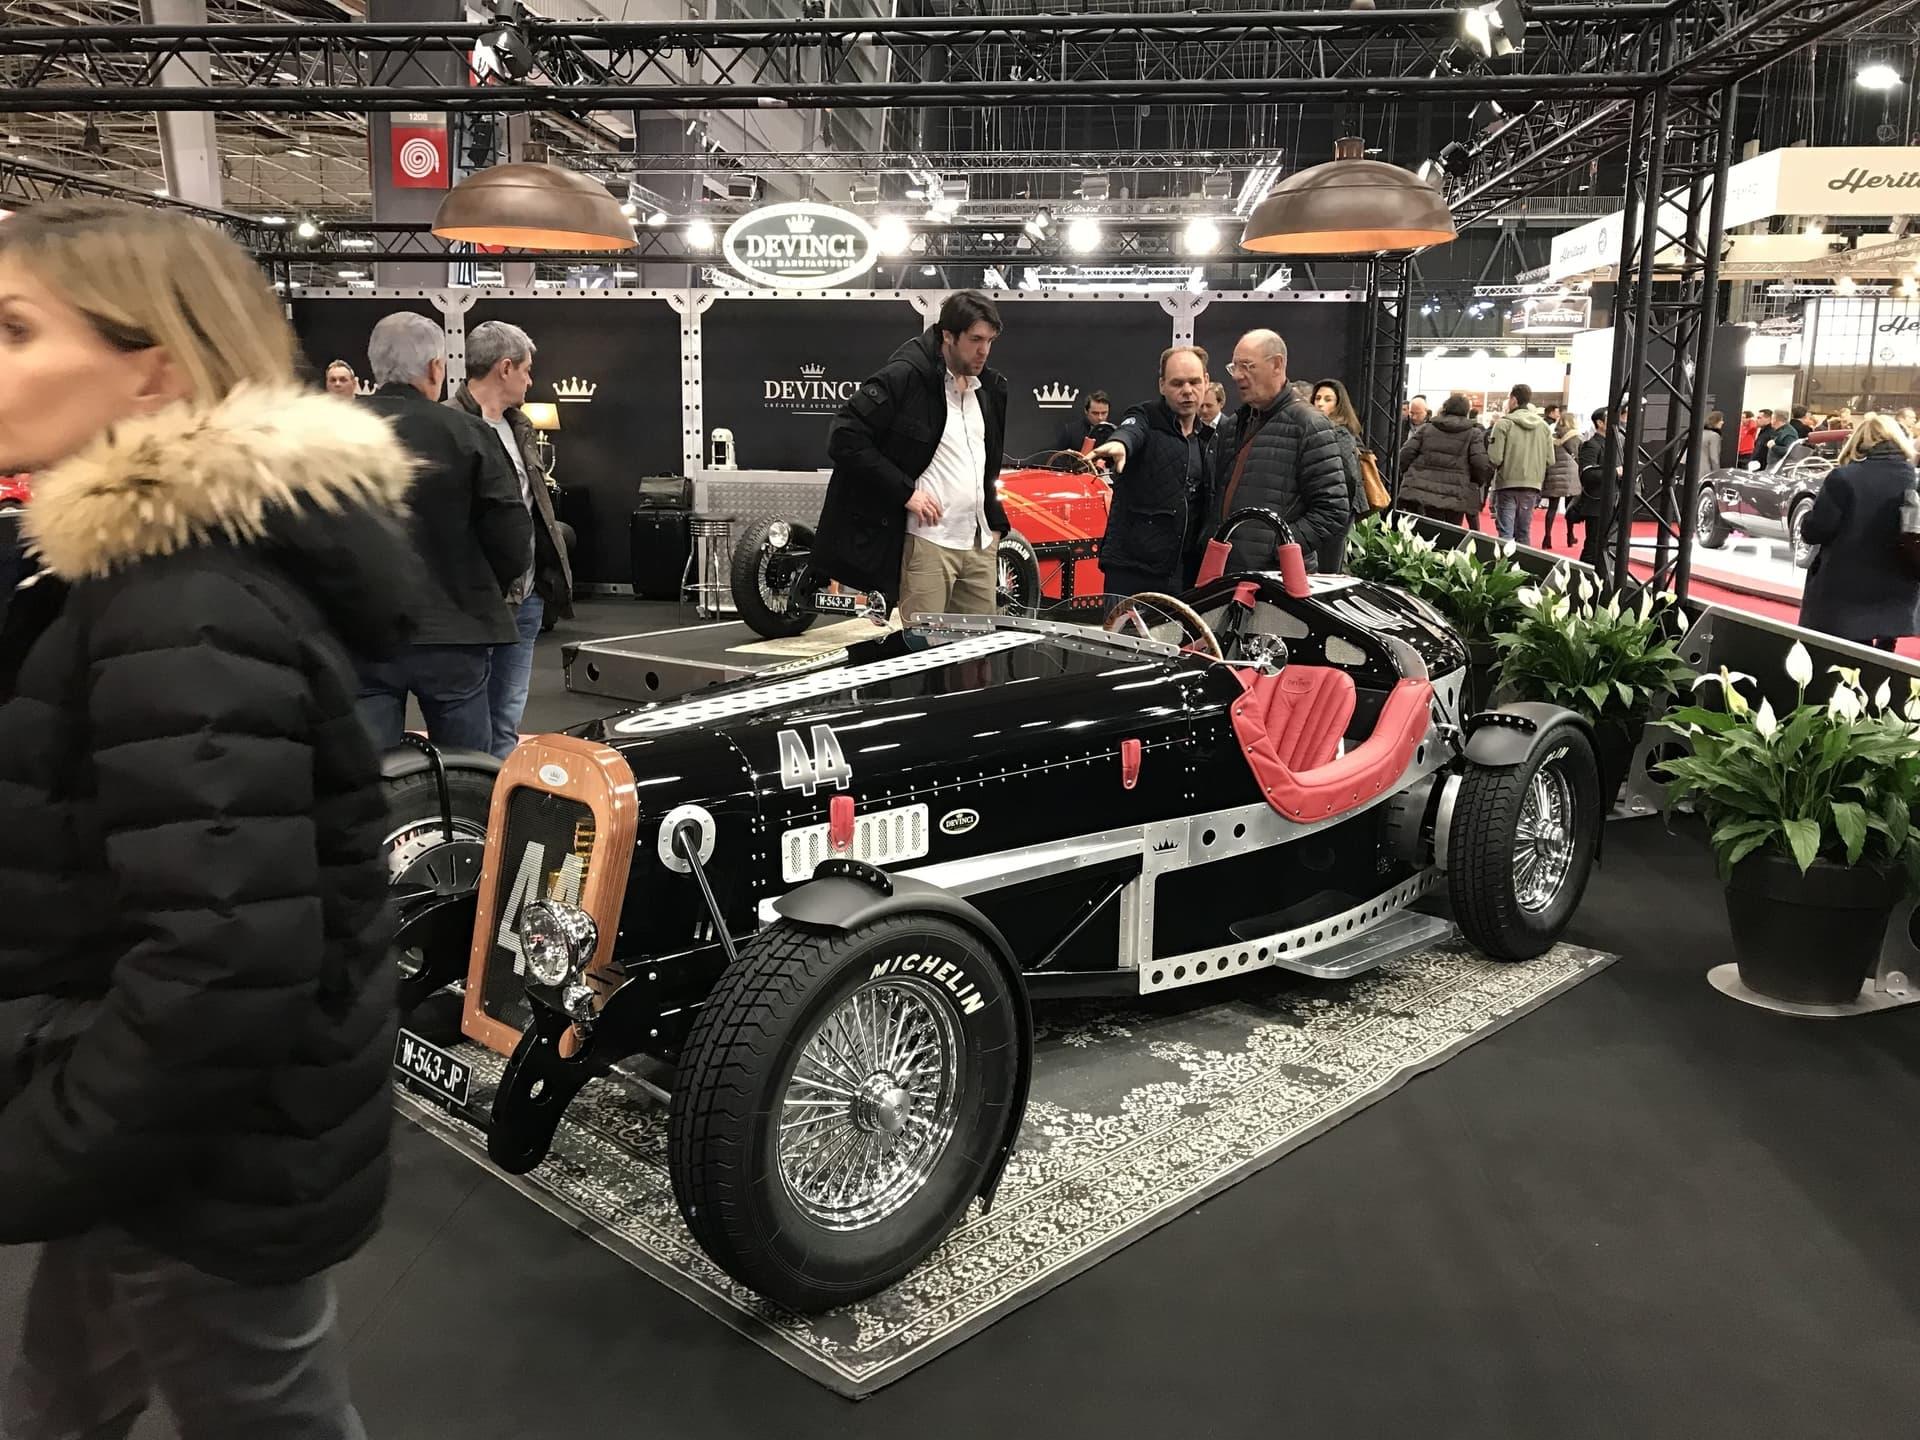 DEVINCI's New Electric Cars Evoke Old Sensibility